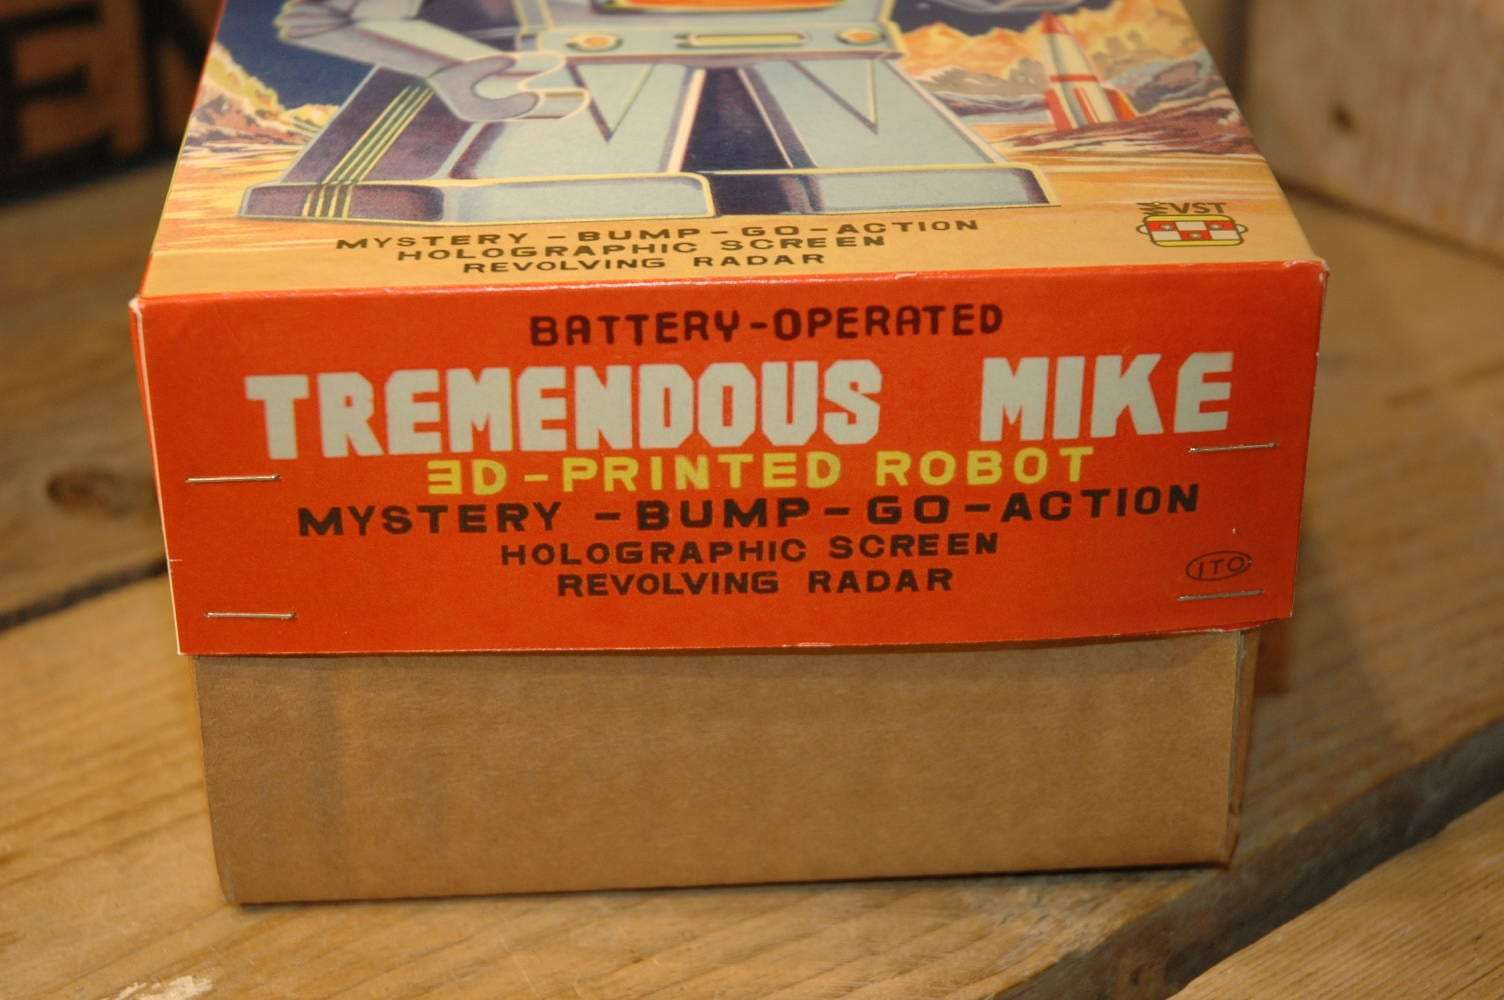 vst - tremendous mike blue variation